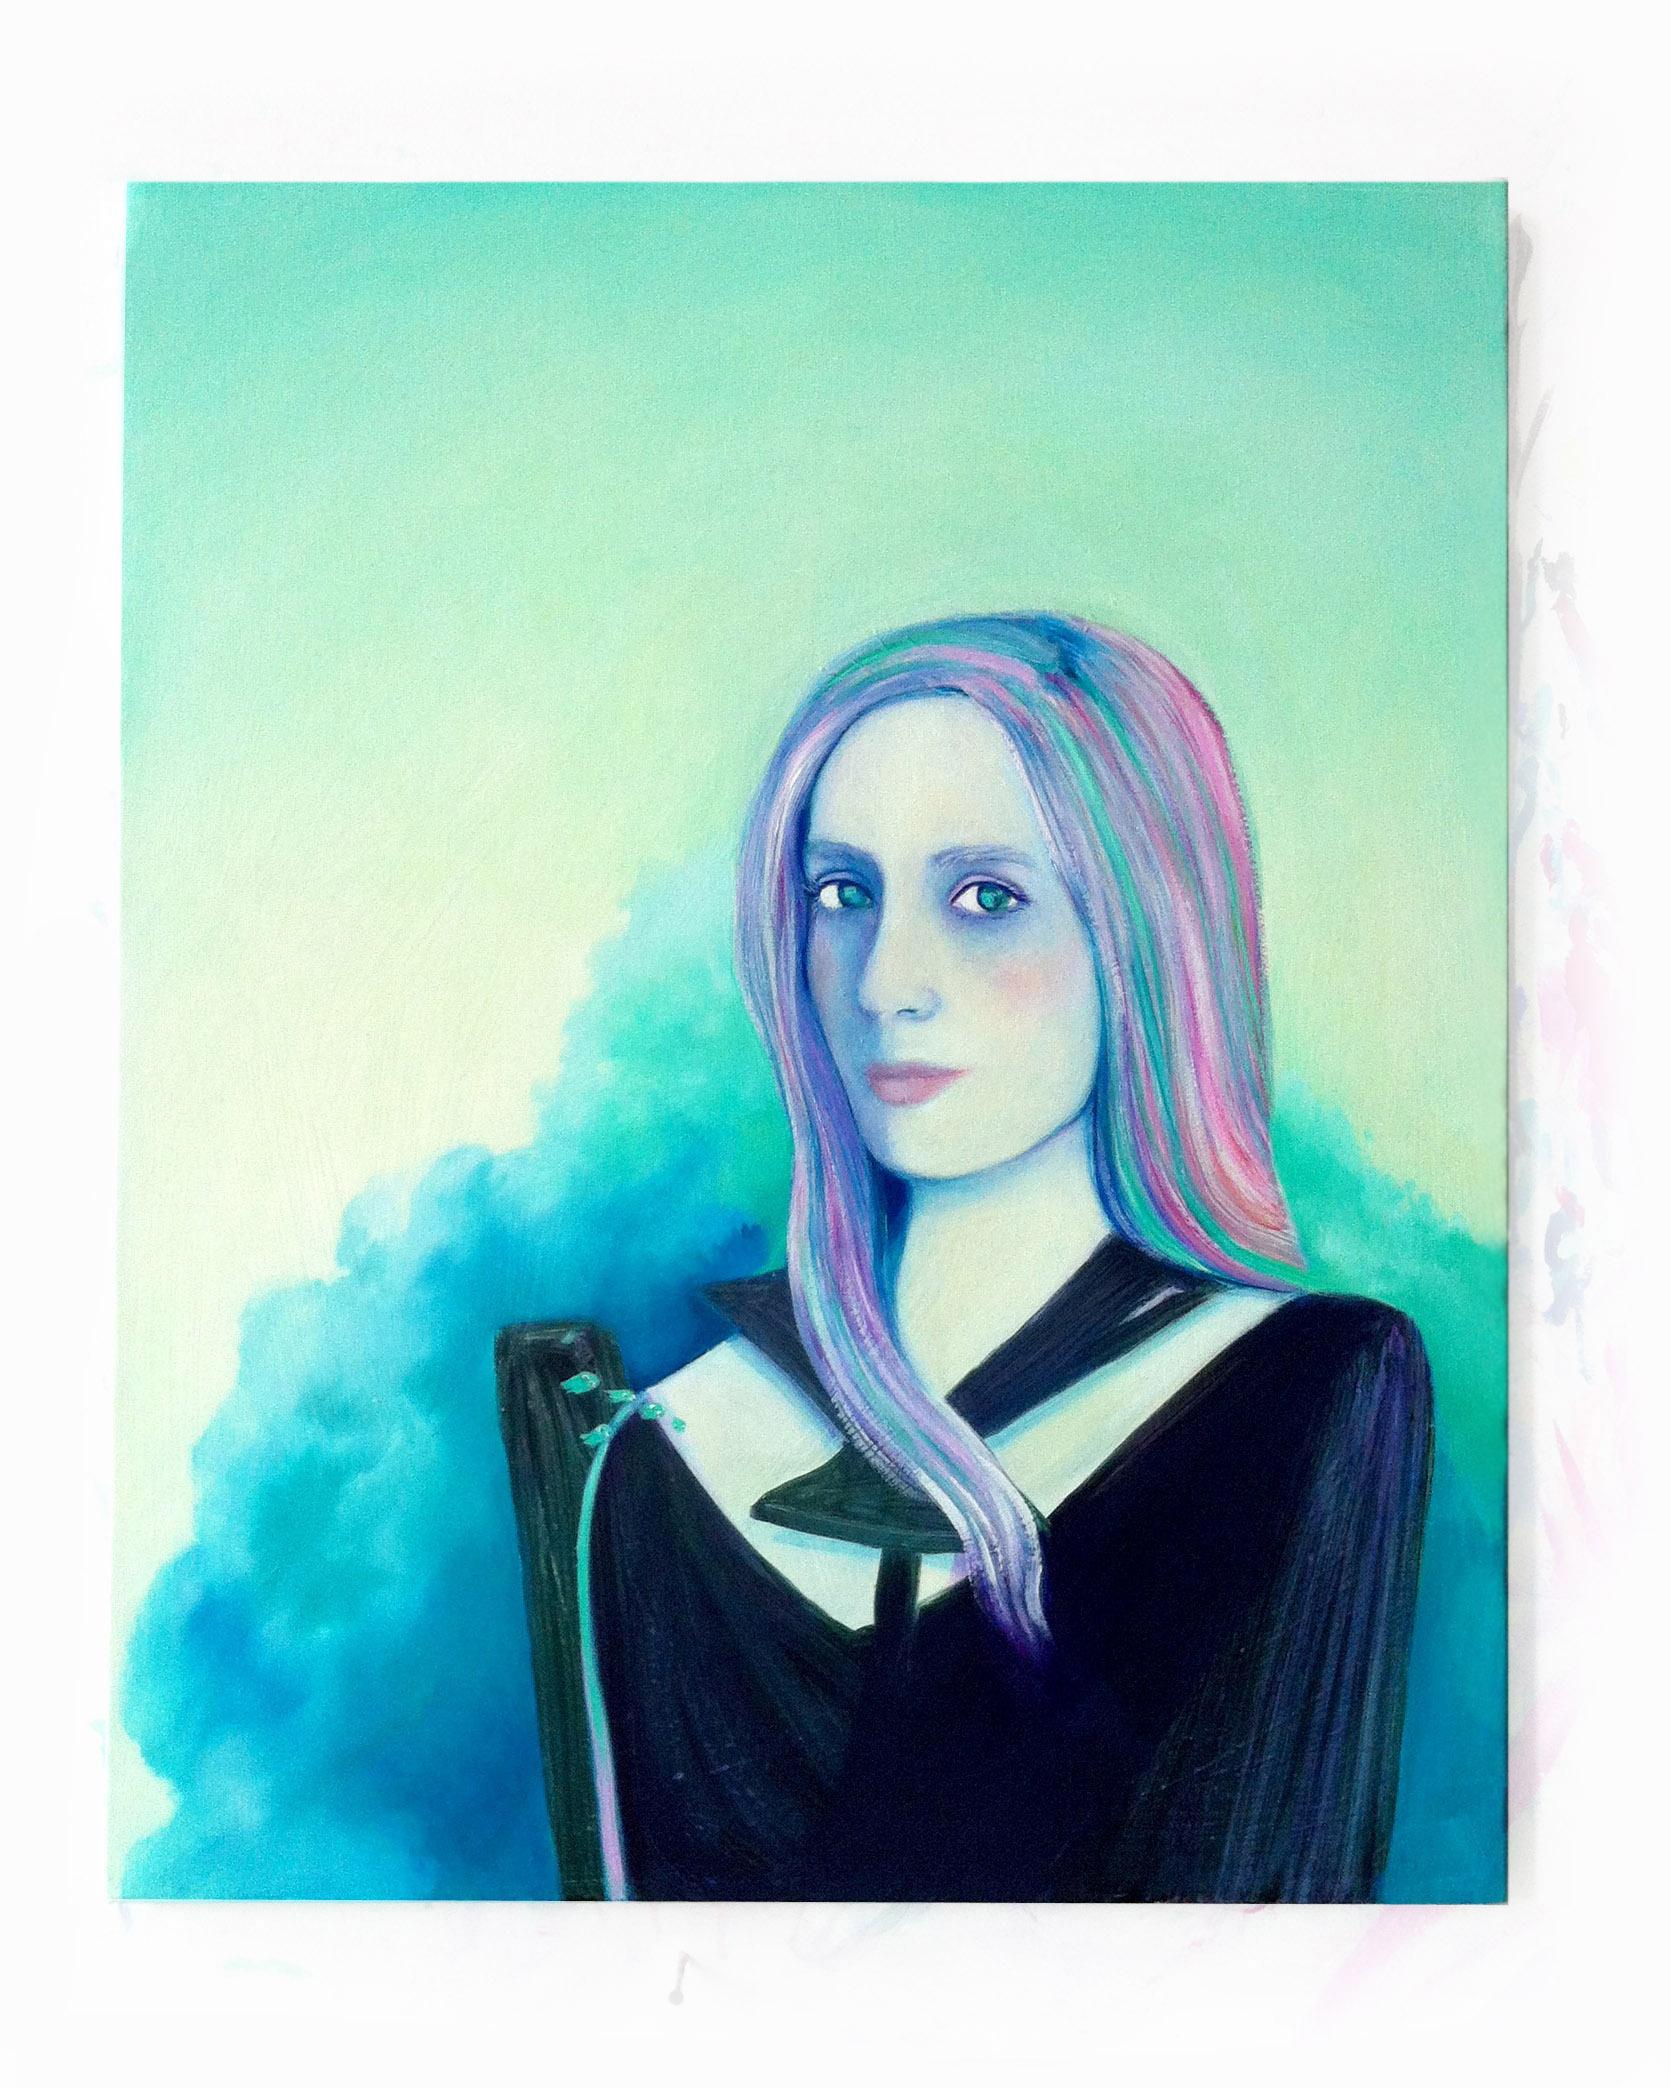 selfie,oil on canvas, 22 x 24 in.2014